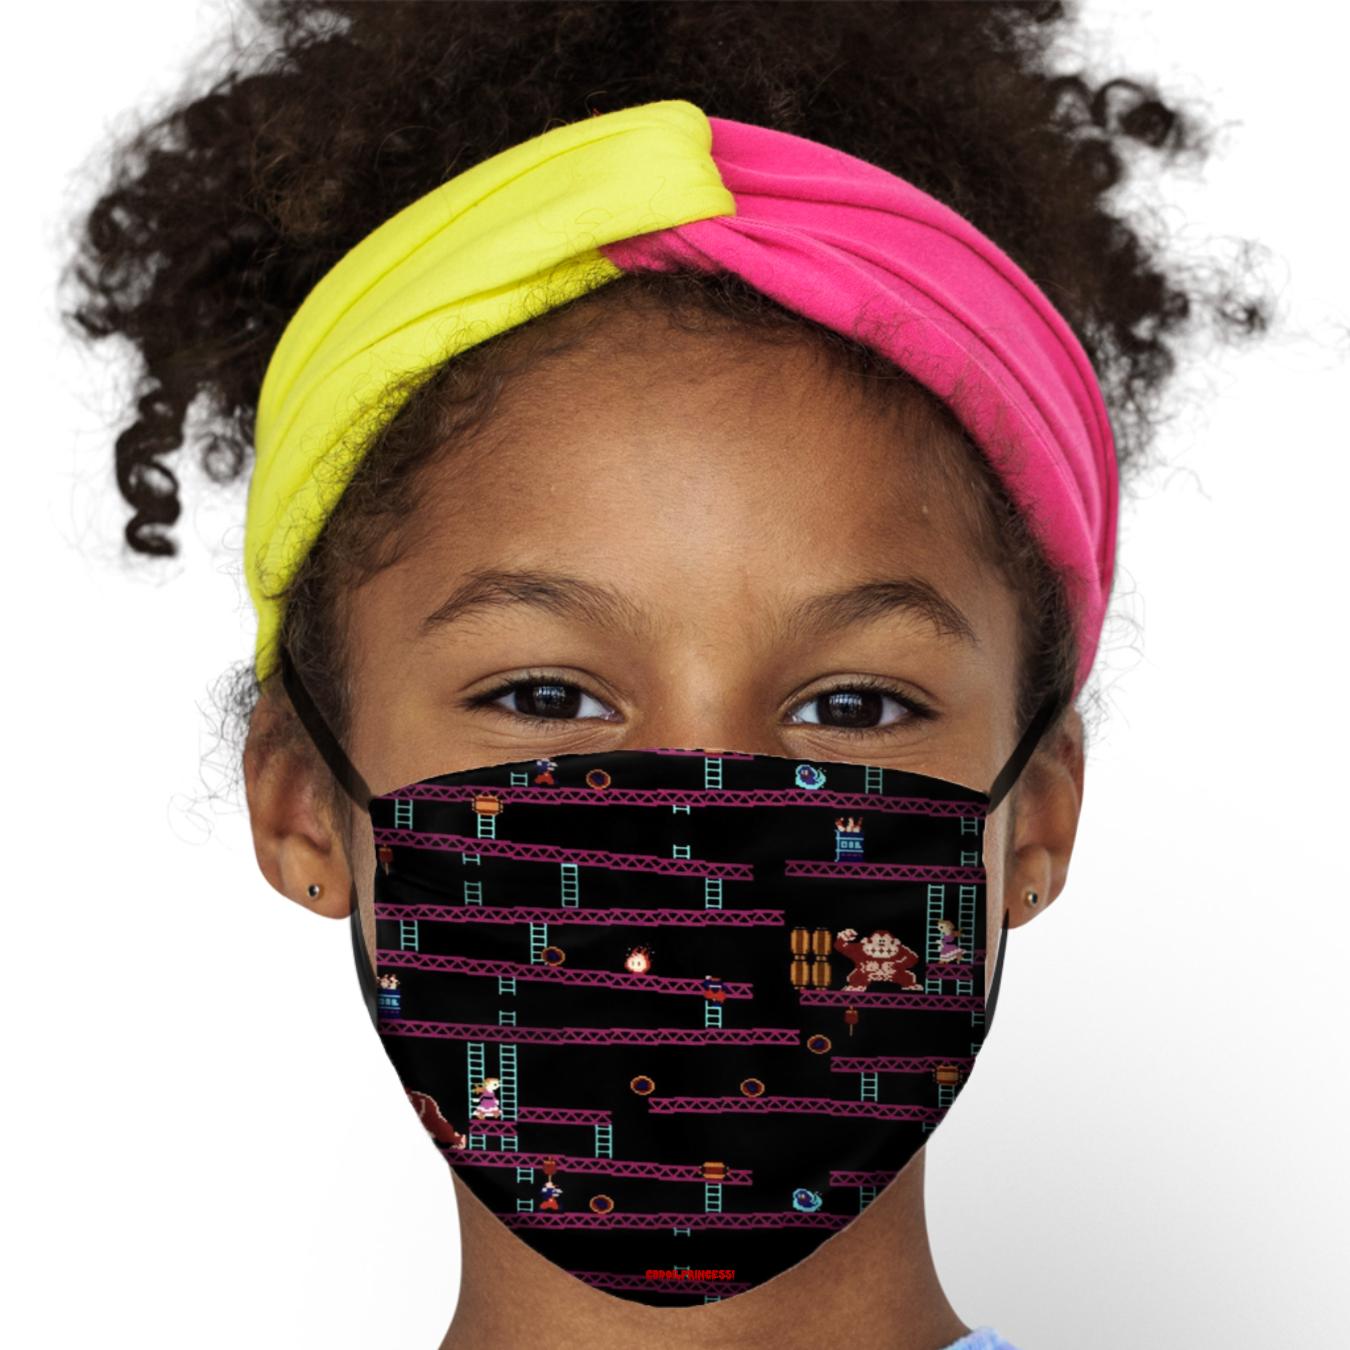 Donkey Kong Arcade Game Kids Face Mask Cbdoilprincess Donkey Kong Arcade Games Face Mask